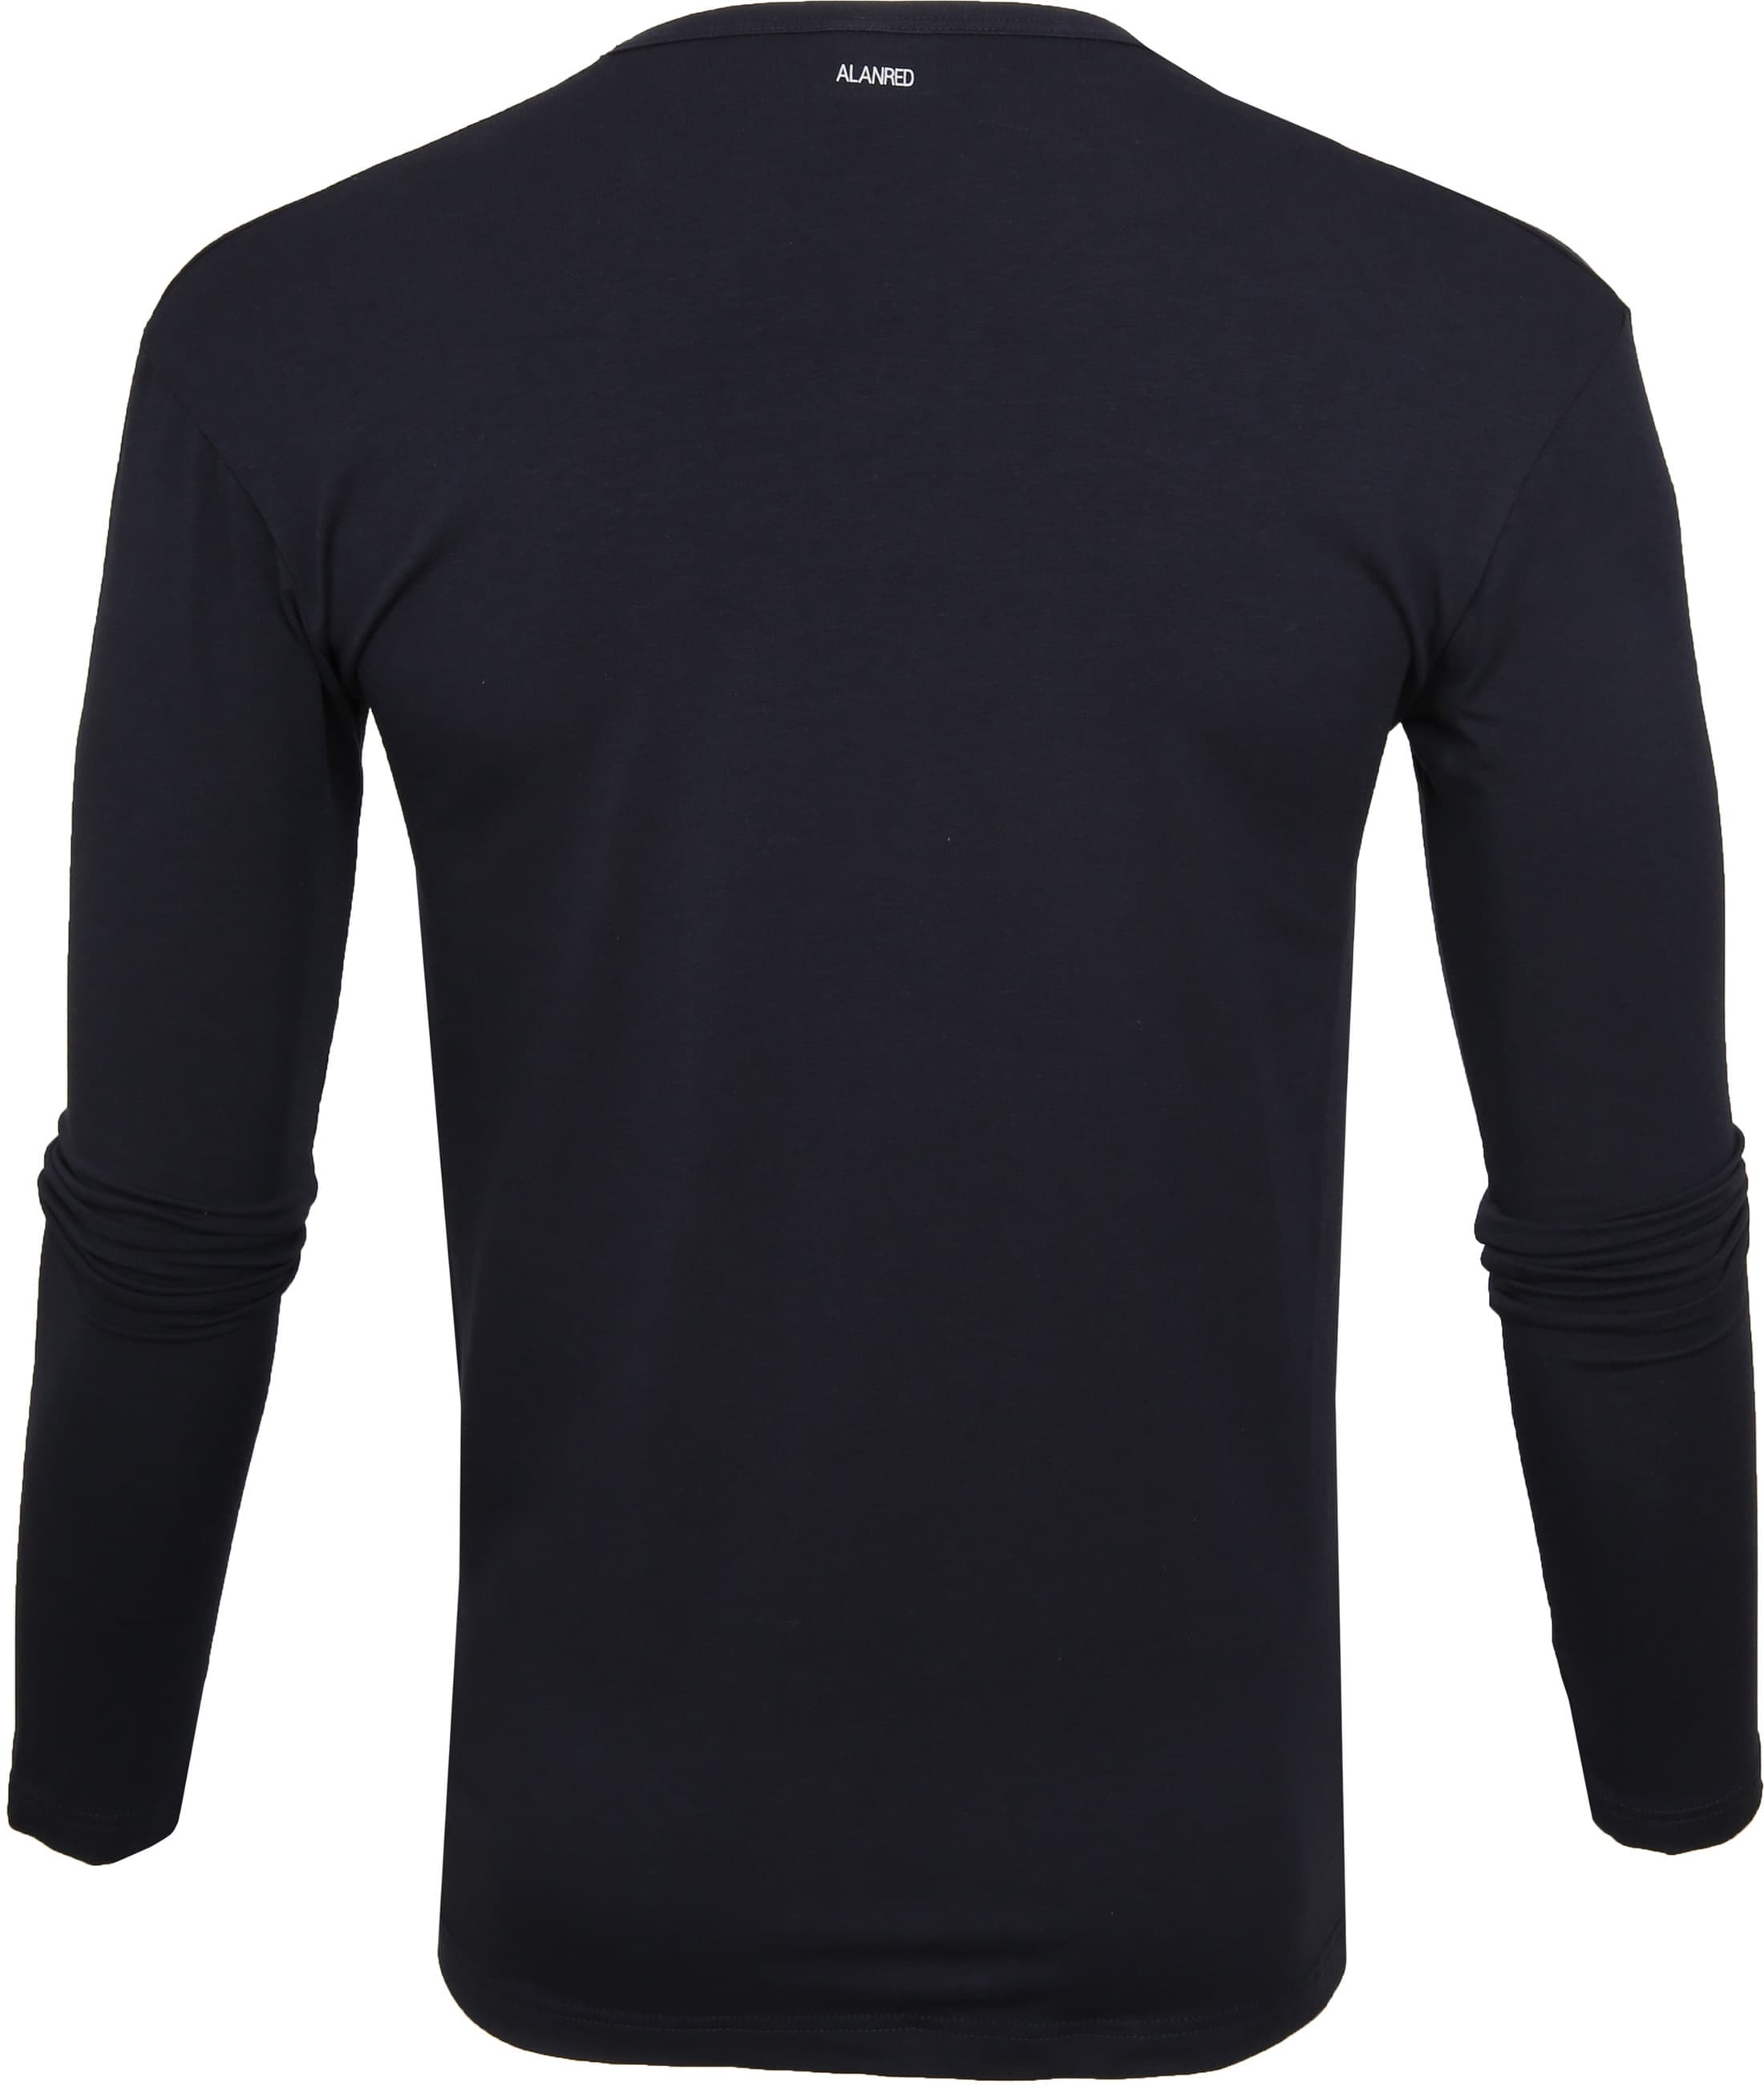 Alan Red Olbia Longsleeve T-shirt Navy foto 2